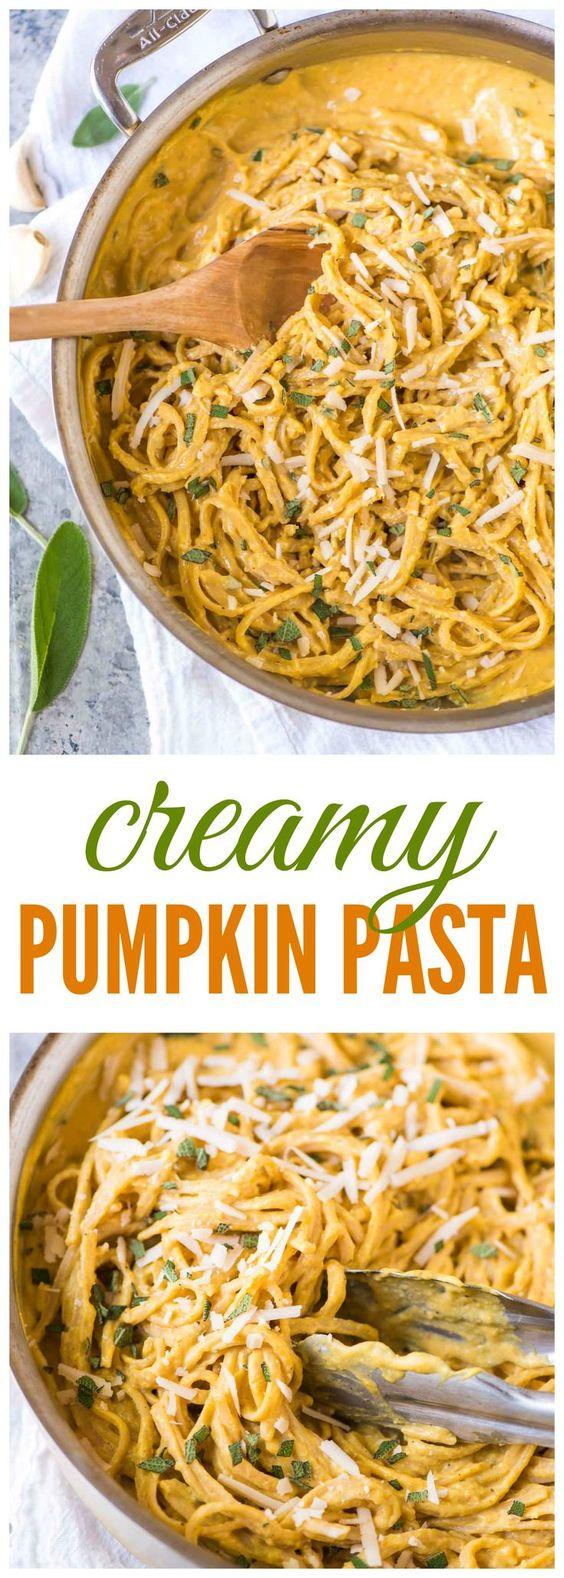 Creamy Pumpkin Pasta